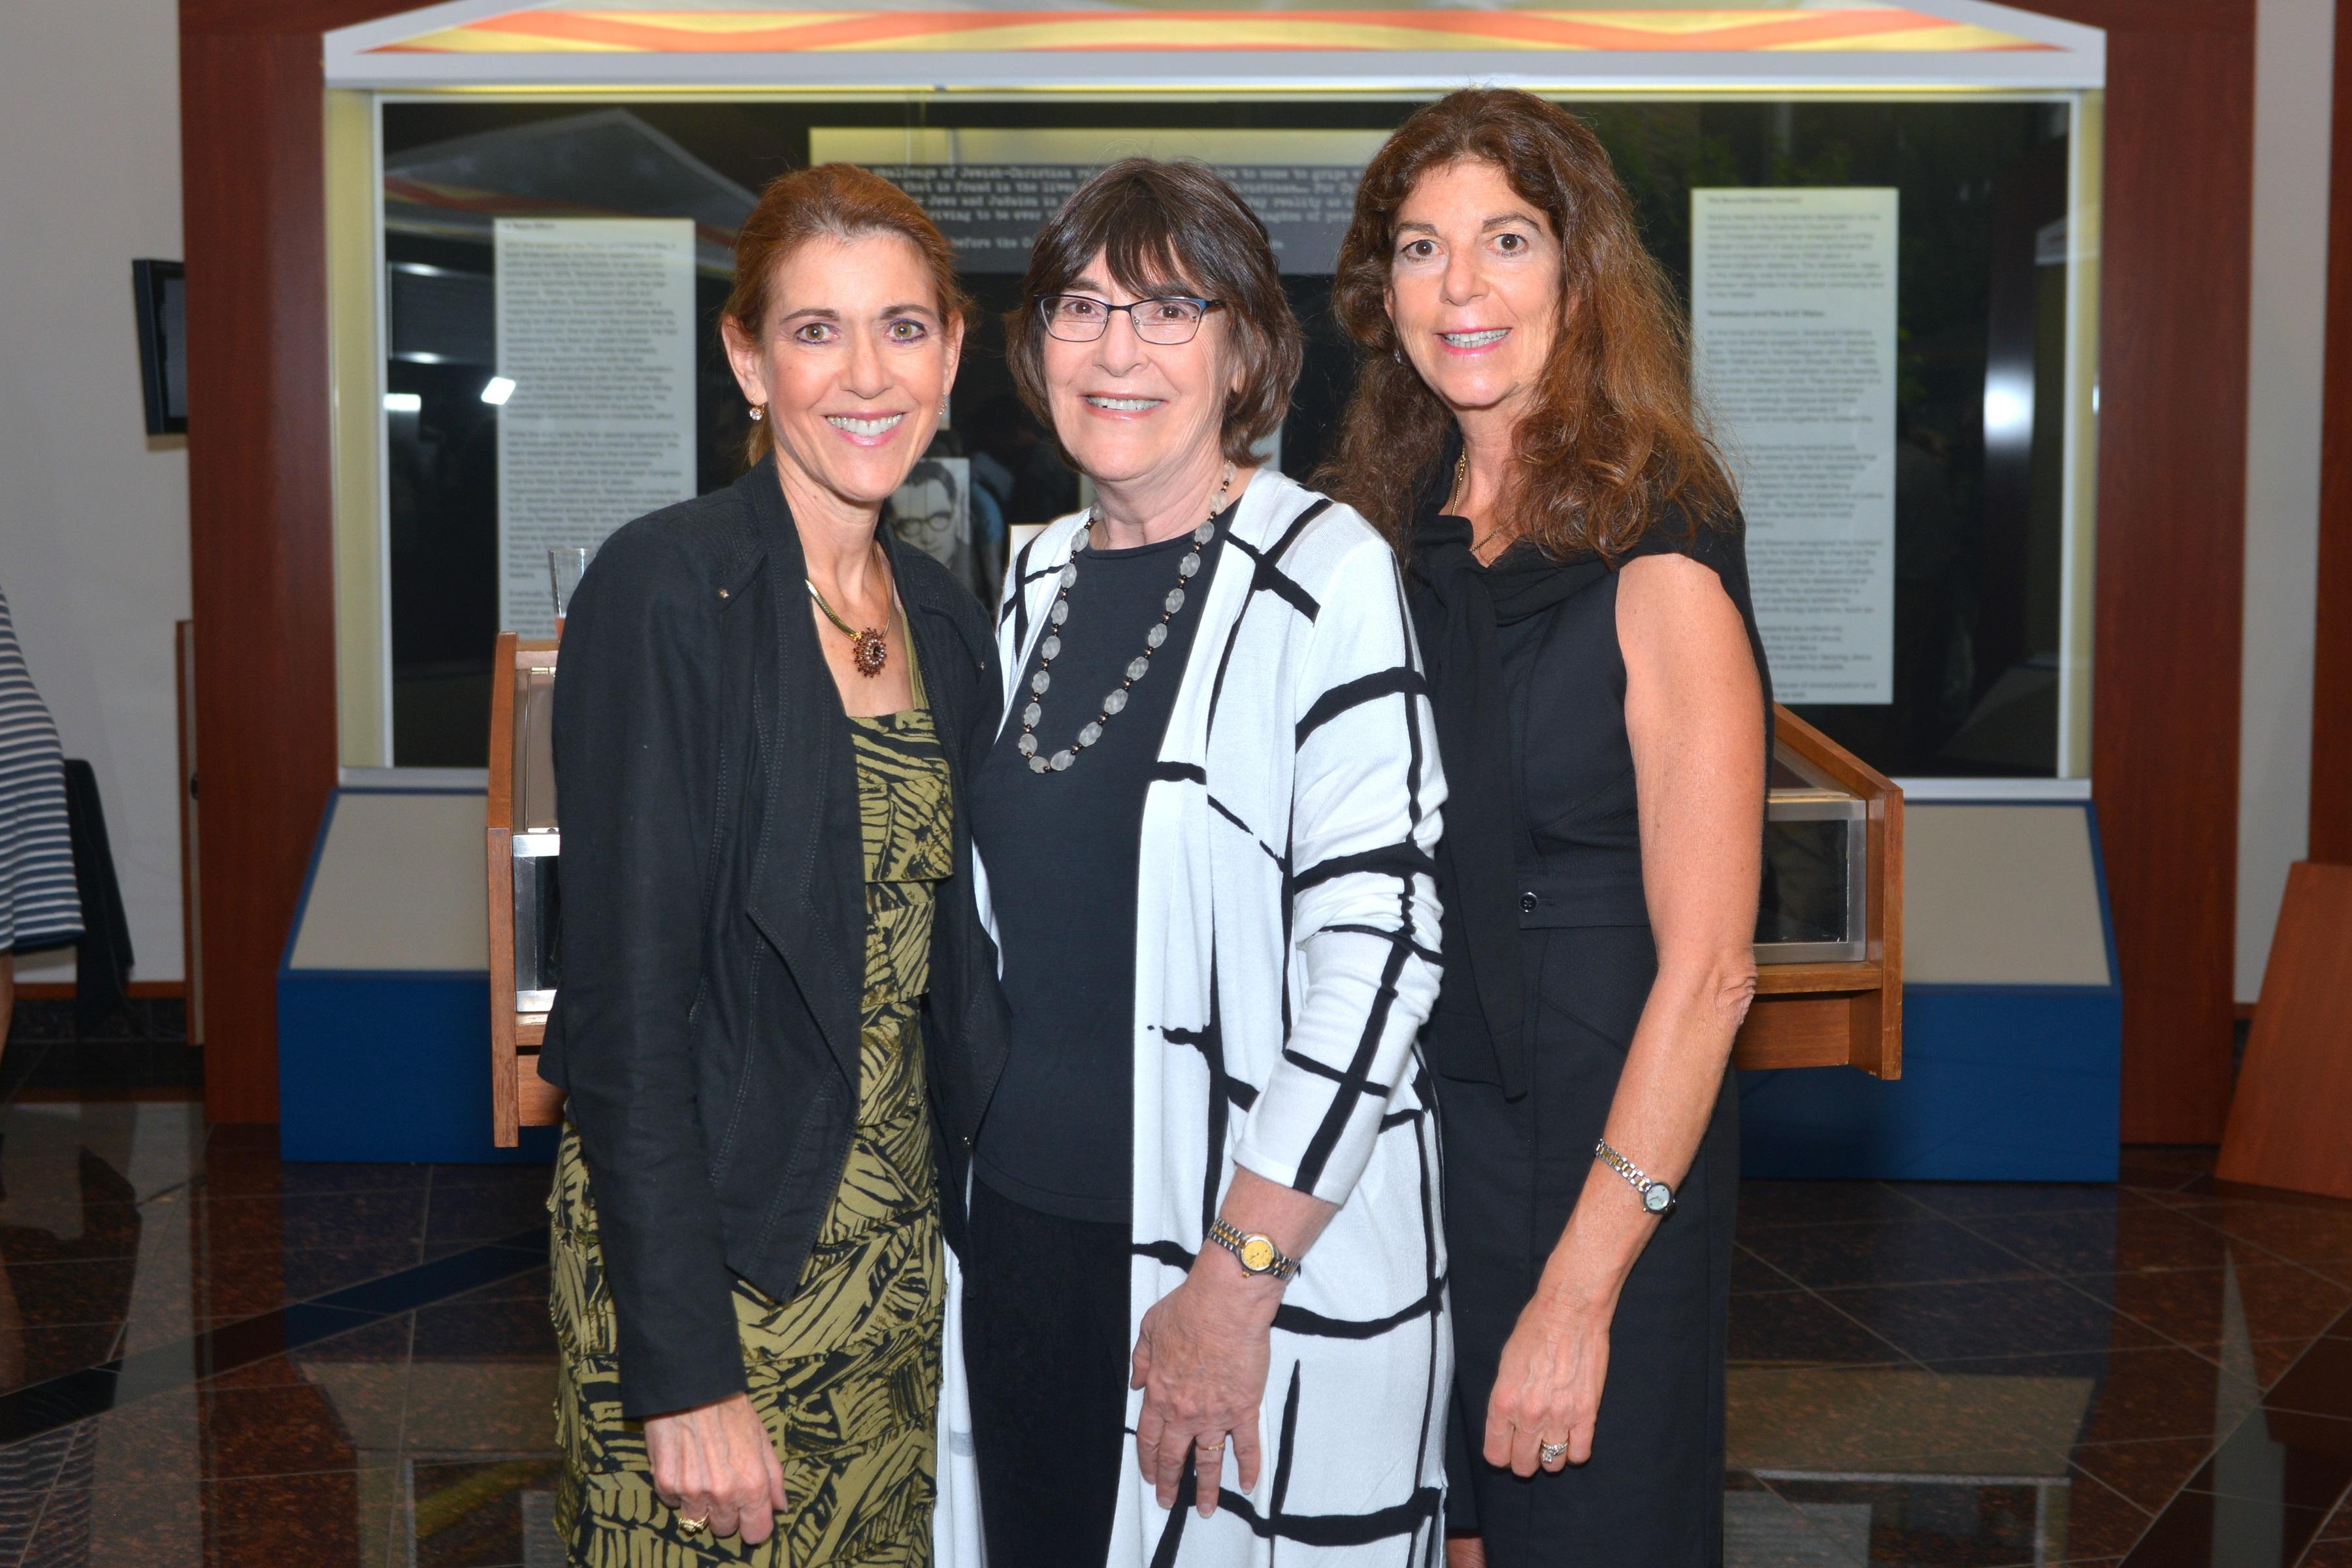 Shelley Sutker-Dermer, Sharon Sutker McGowan and Edie Sue Sutker